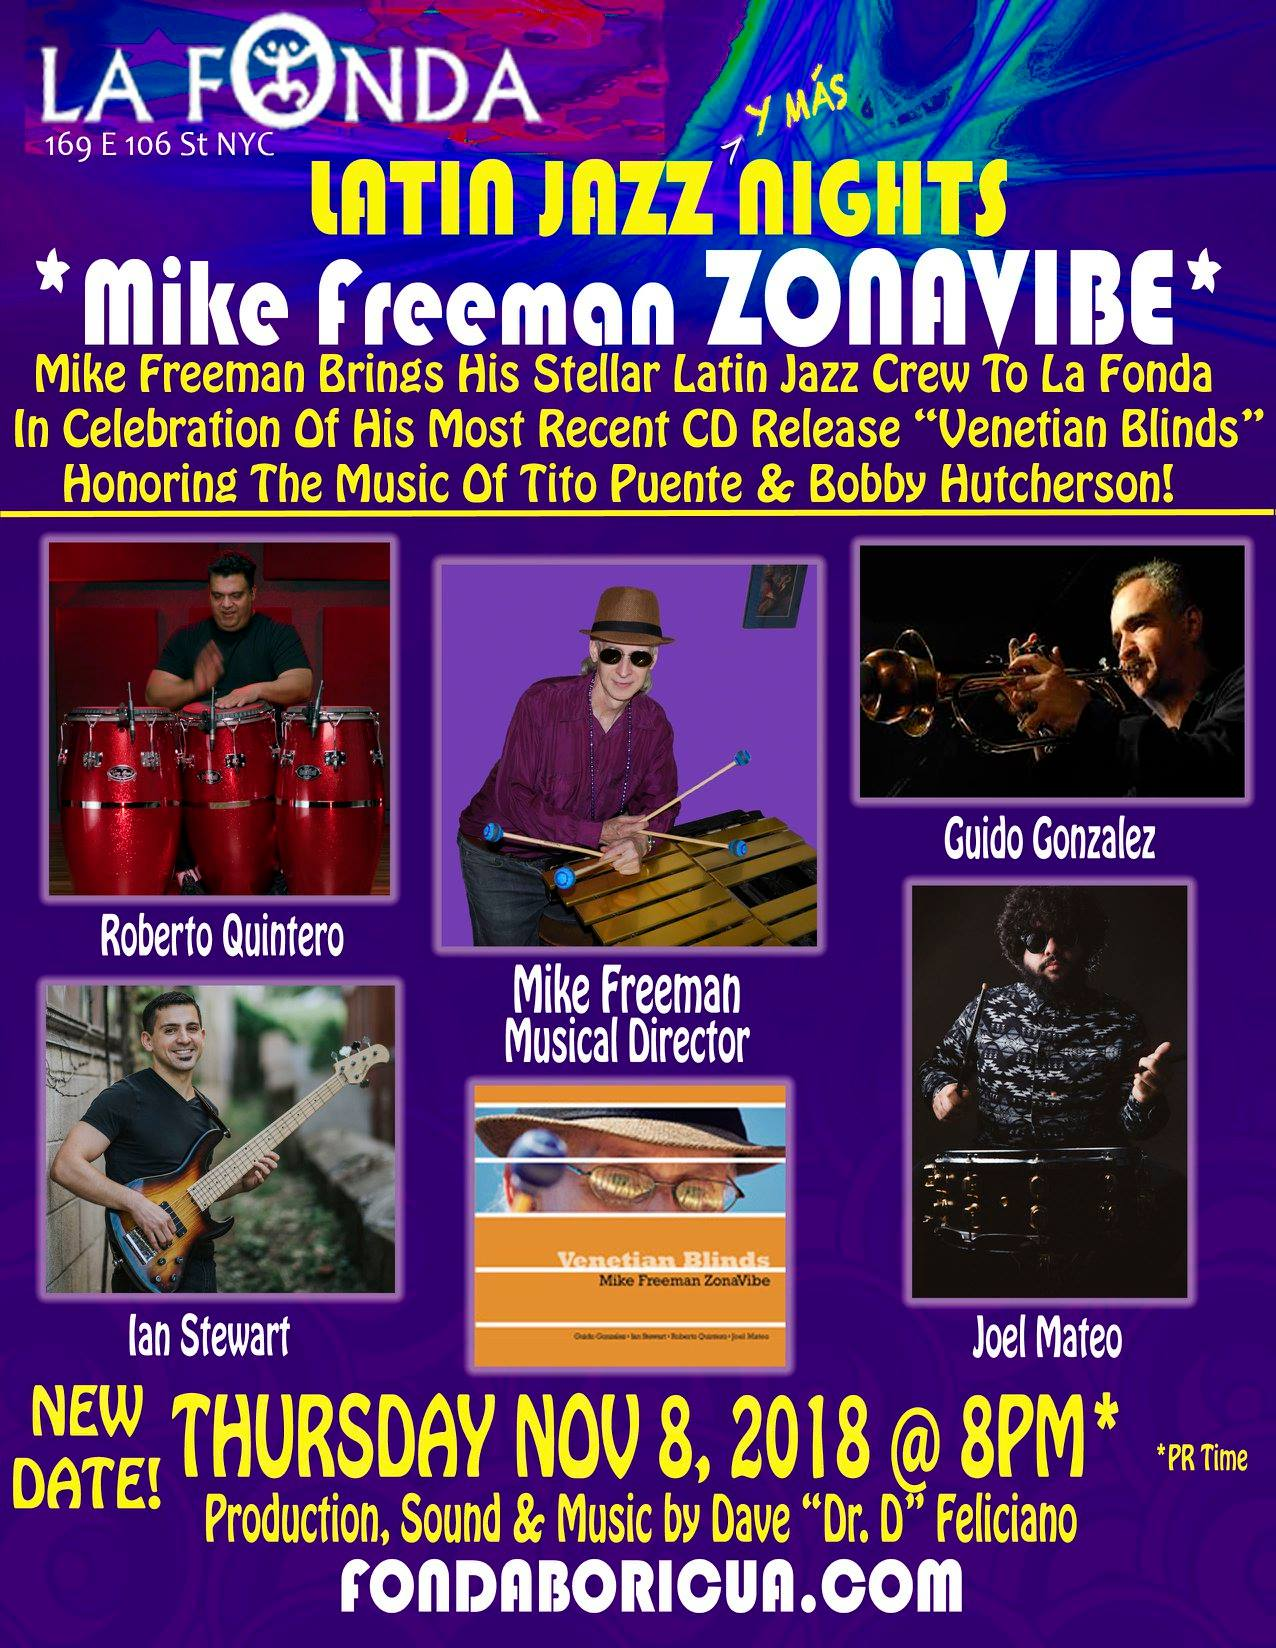 Mike Freeman Zonavibe